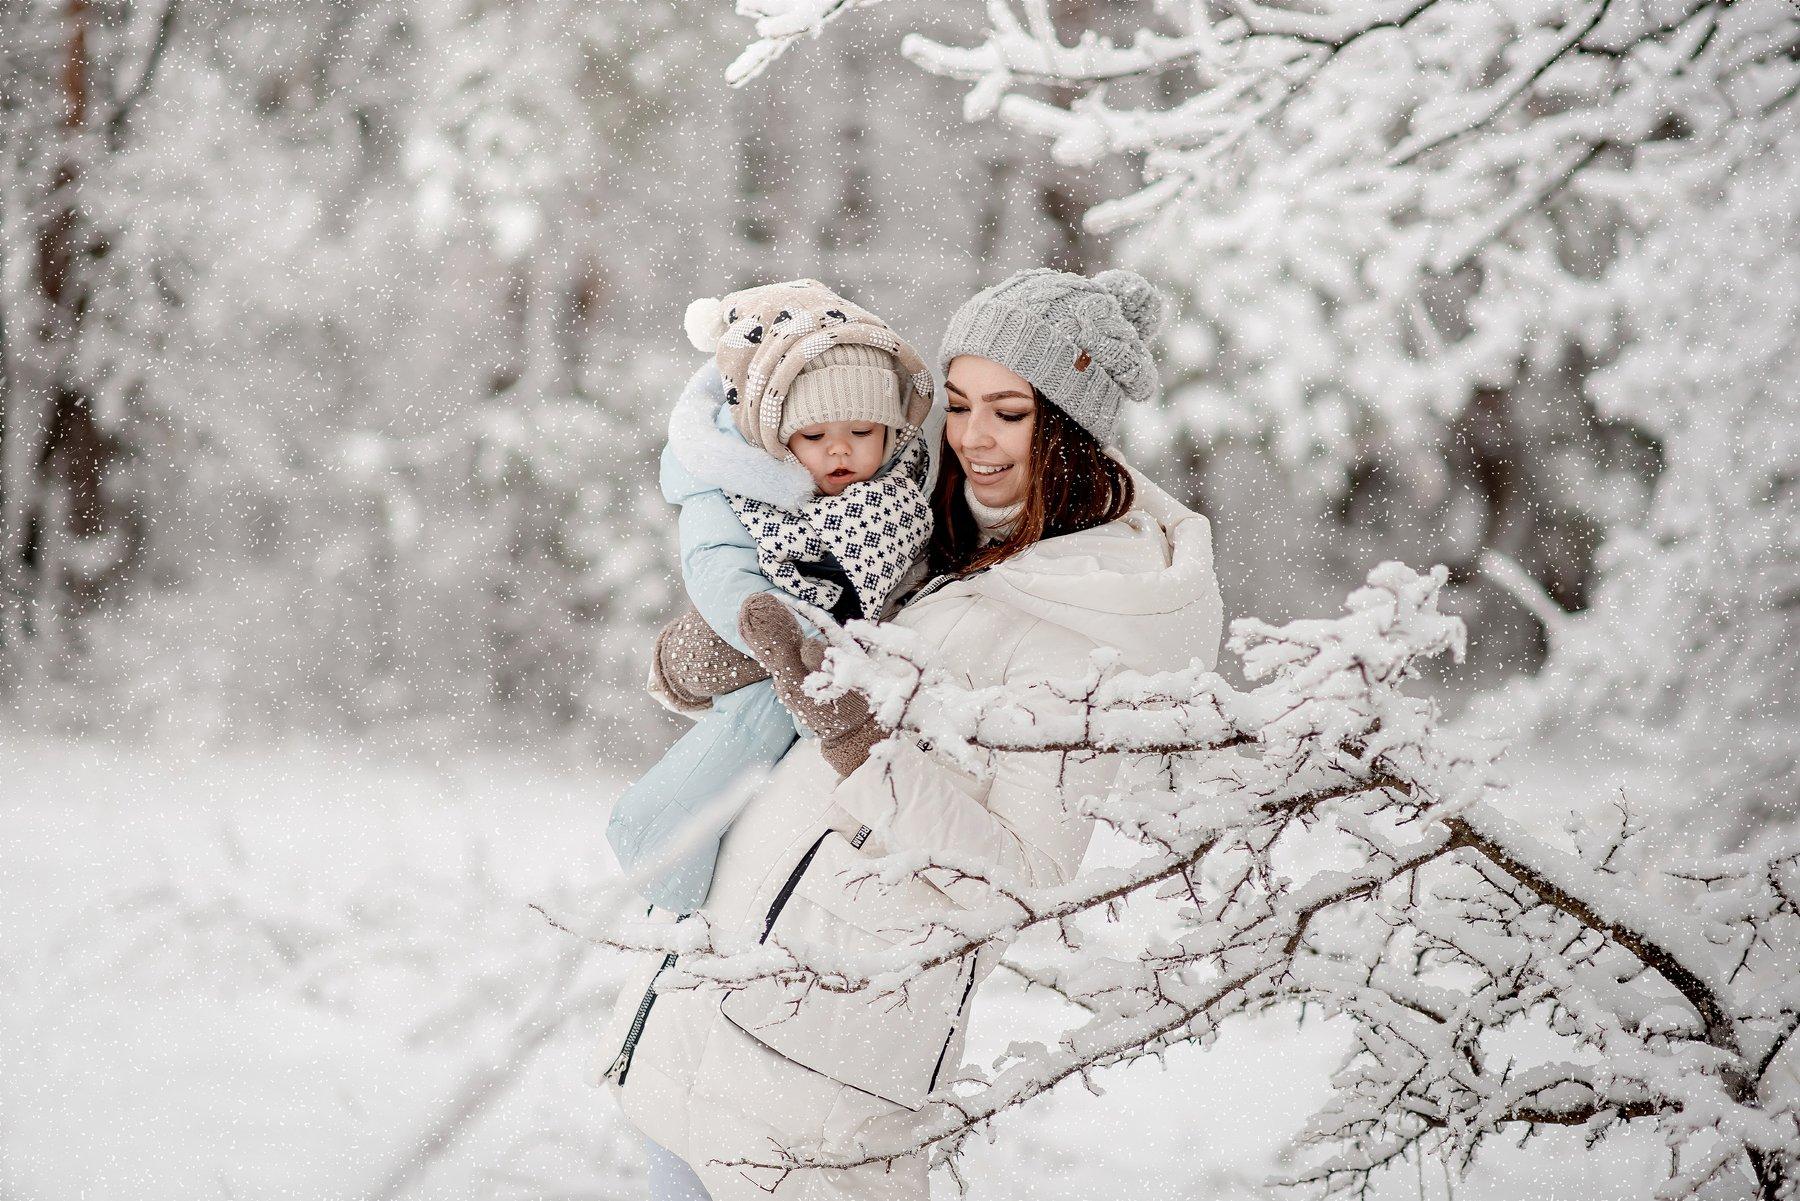 ребенок, мама, семья, зима, лес, Стрелкова Мария